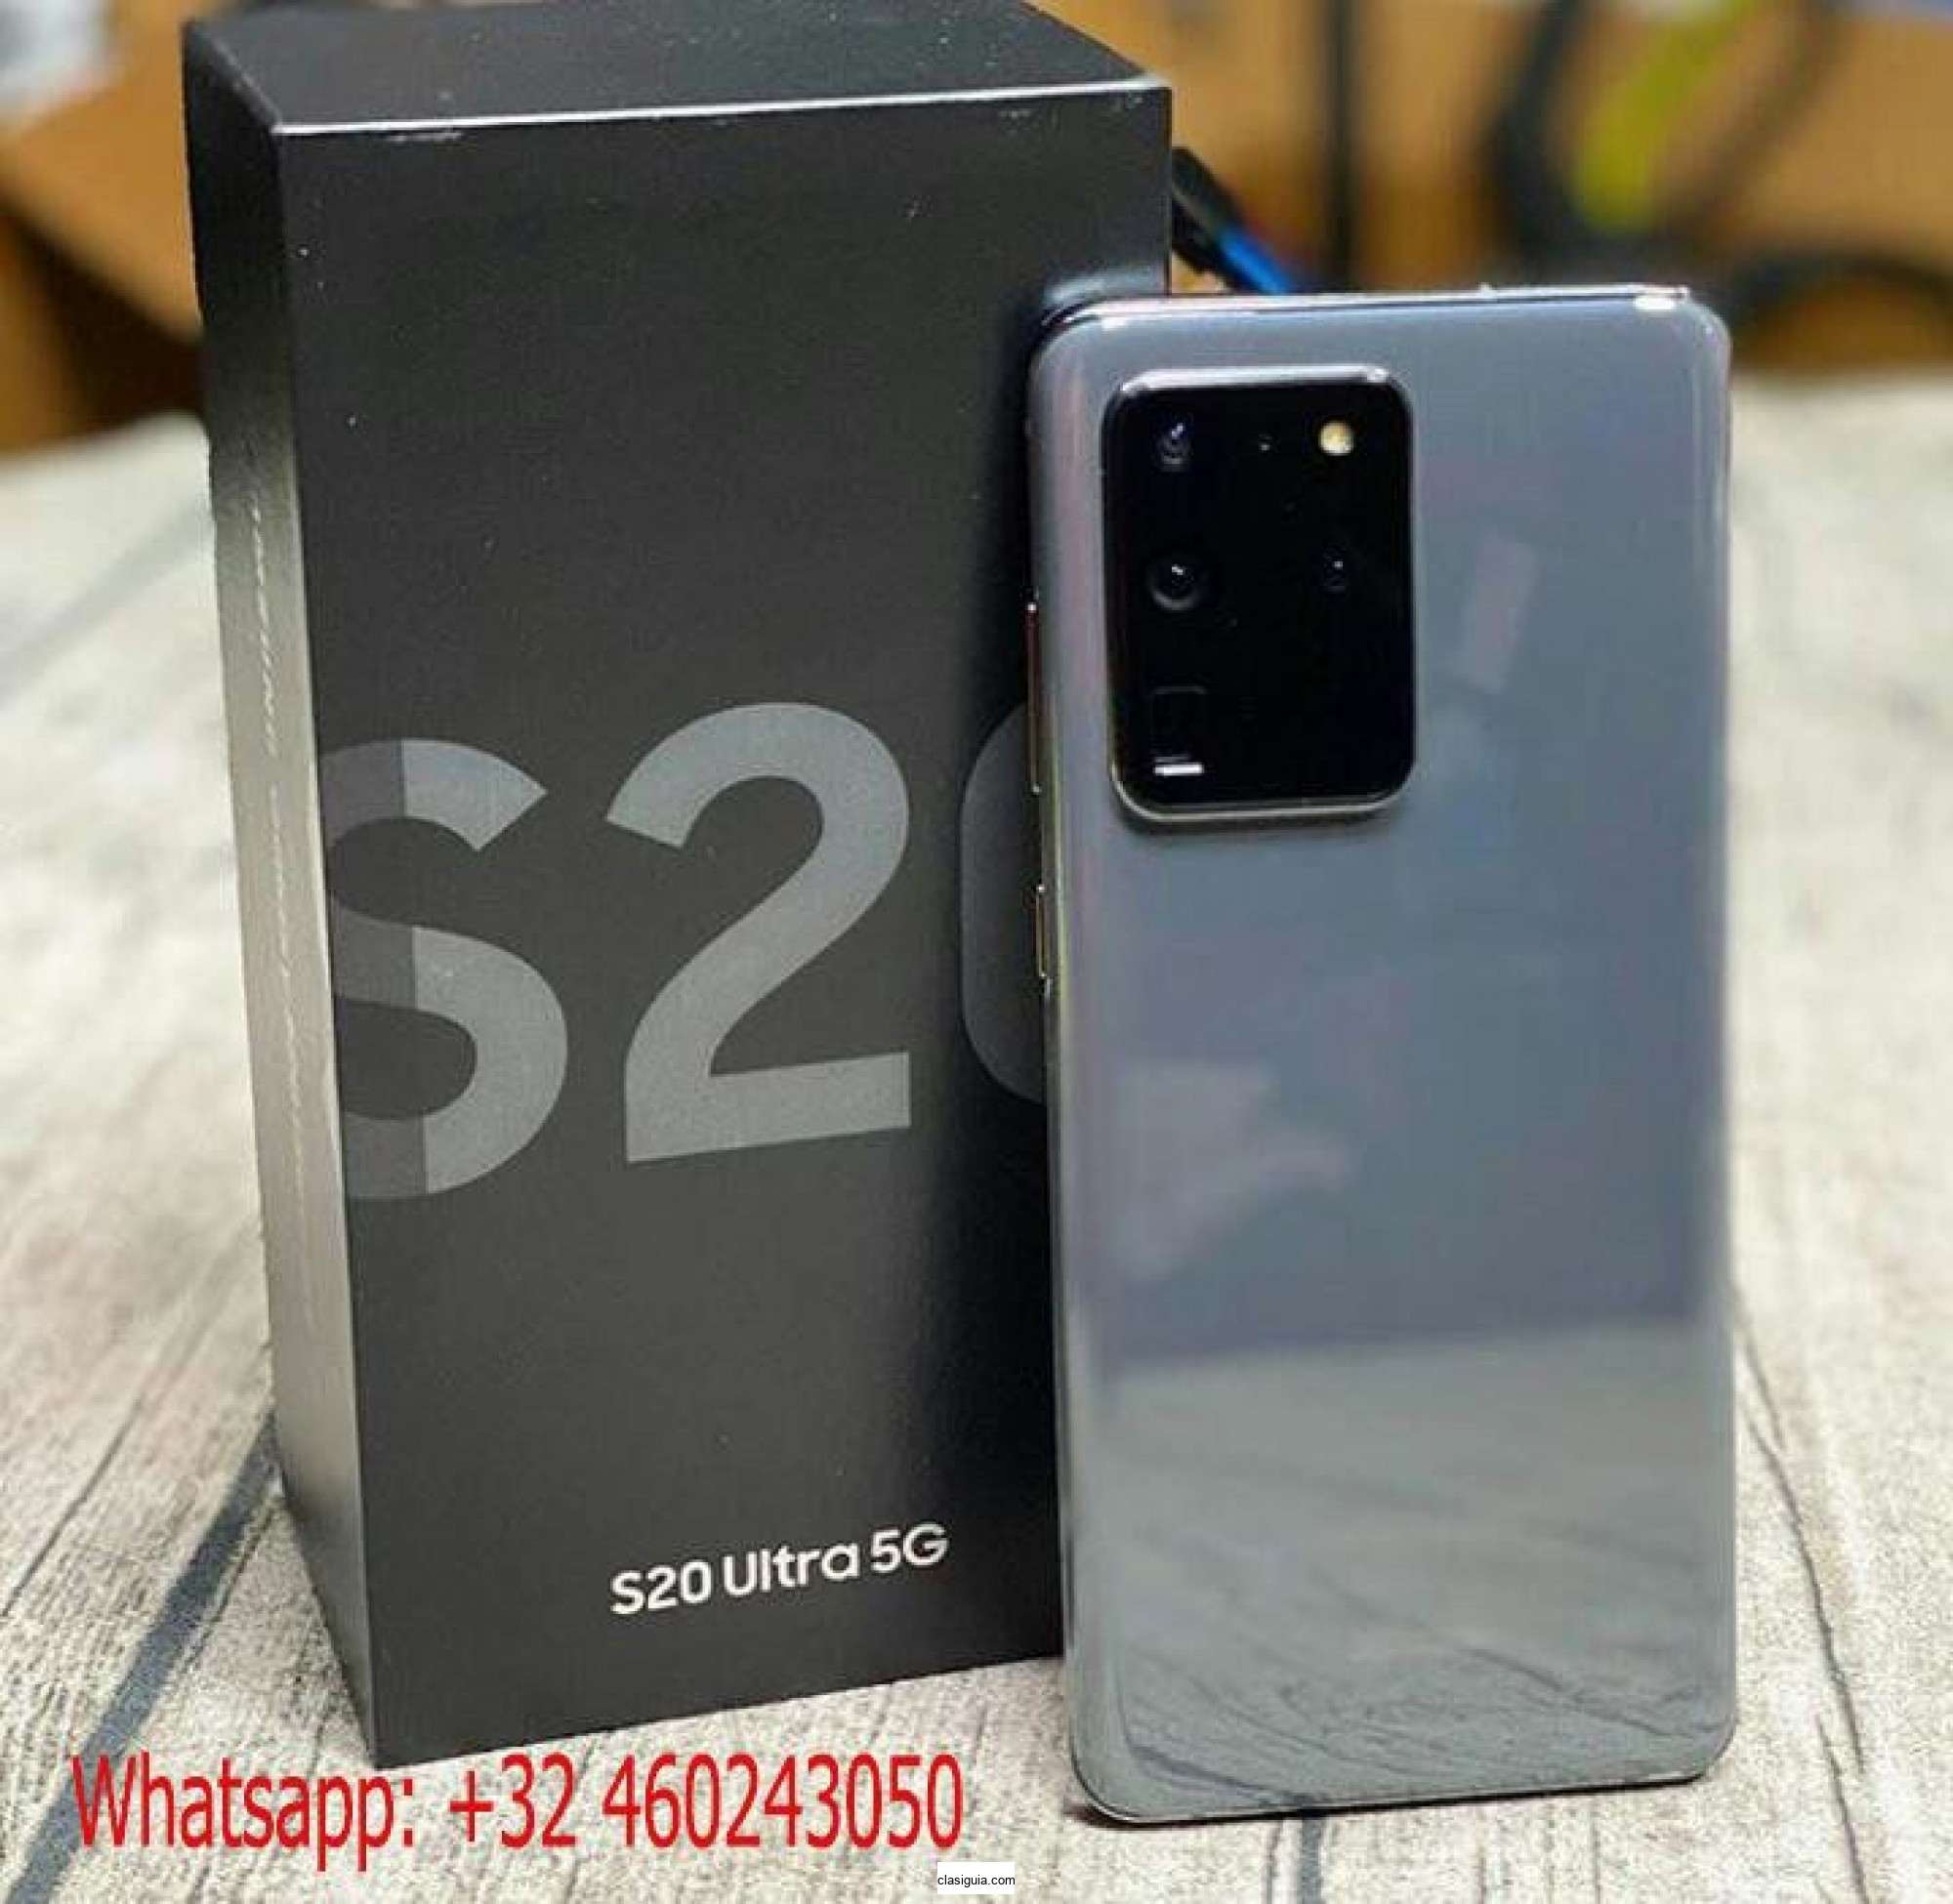 Samsung Galaxy S20 Ultra, S20 +, S20, Z Flip, S10 +, S10, Huawei P30 Pro